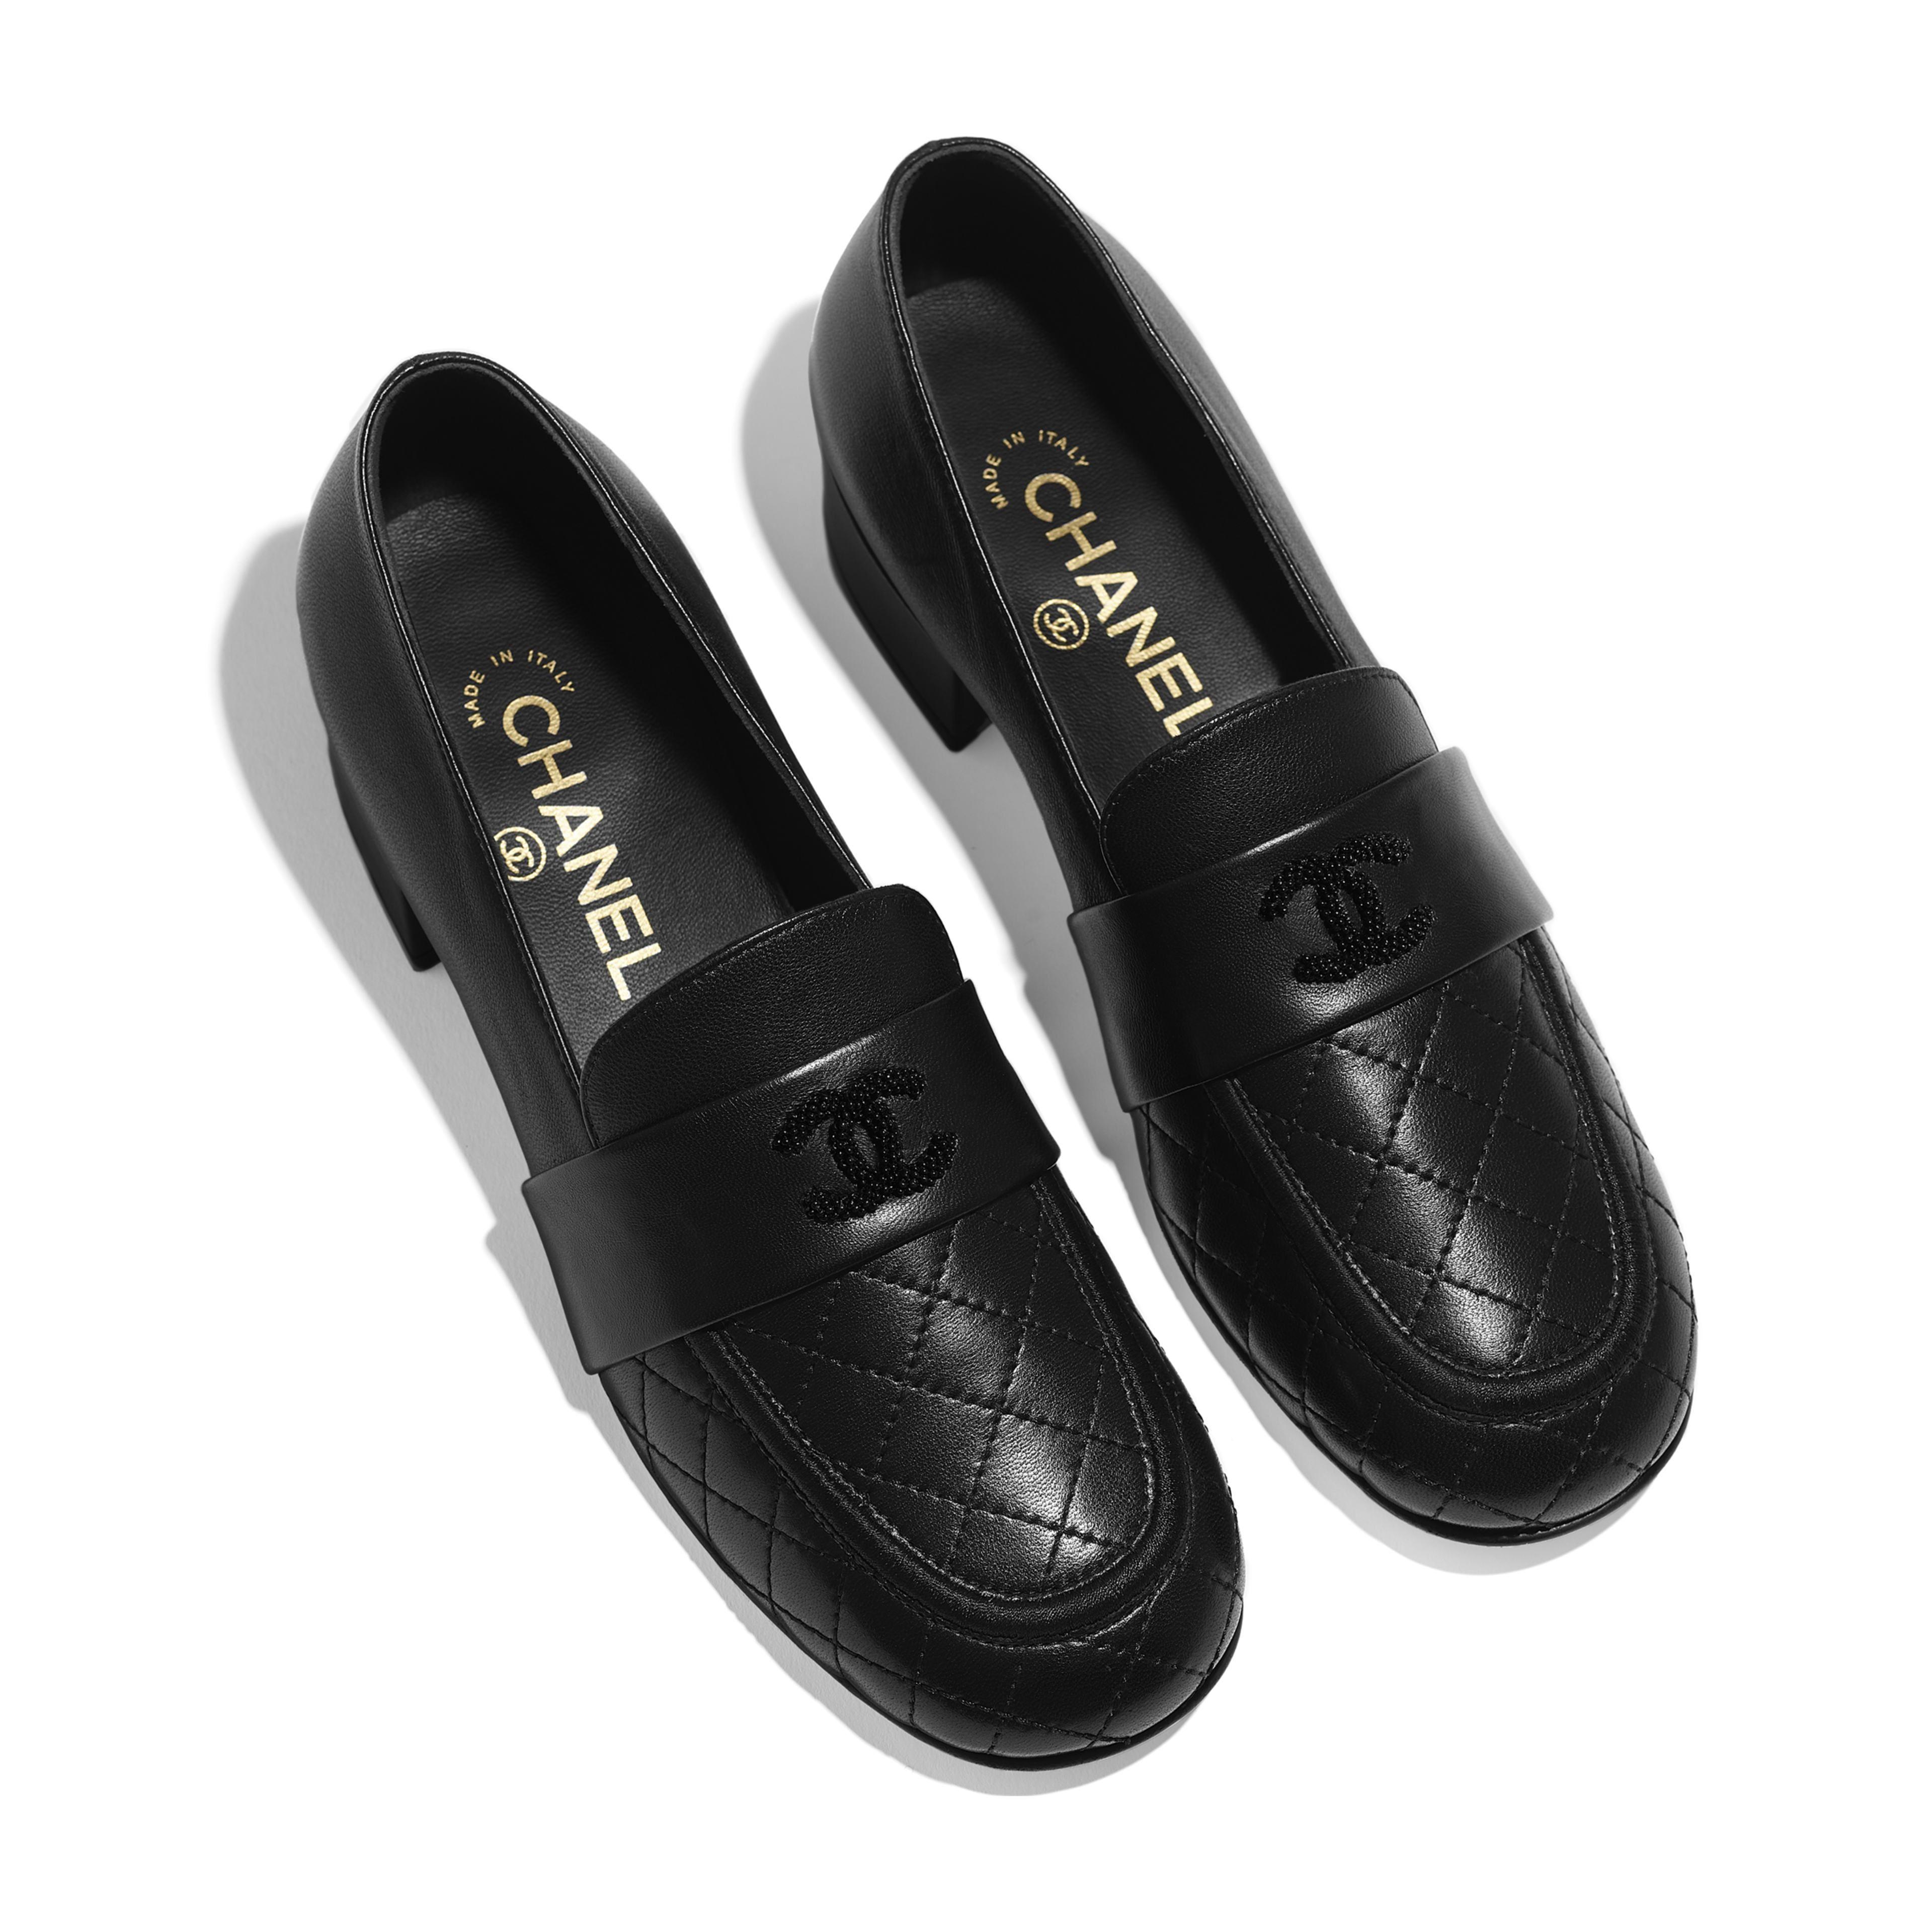 Dress shoes men, Loafers men, Chanel